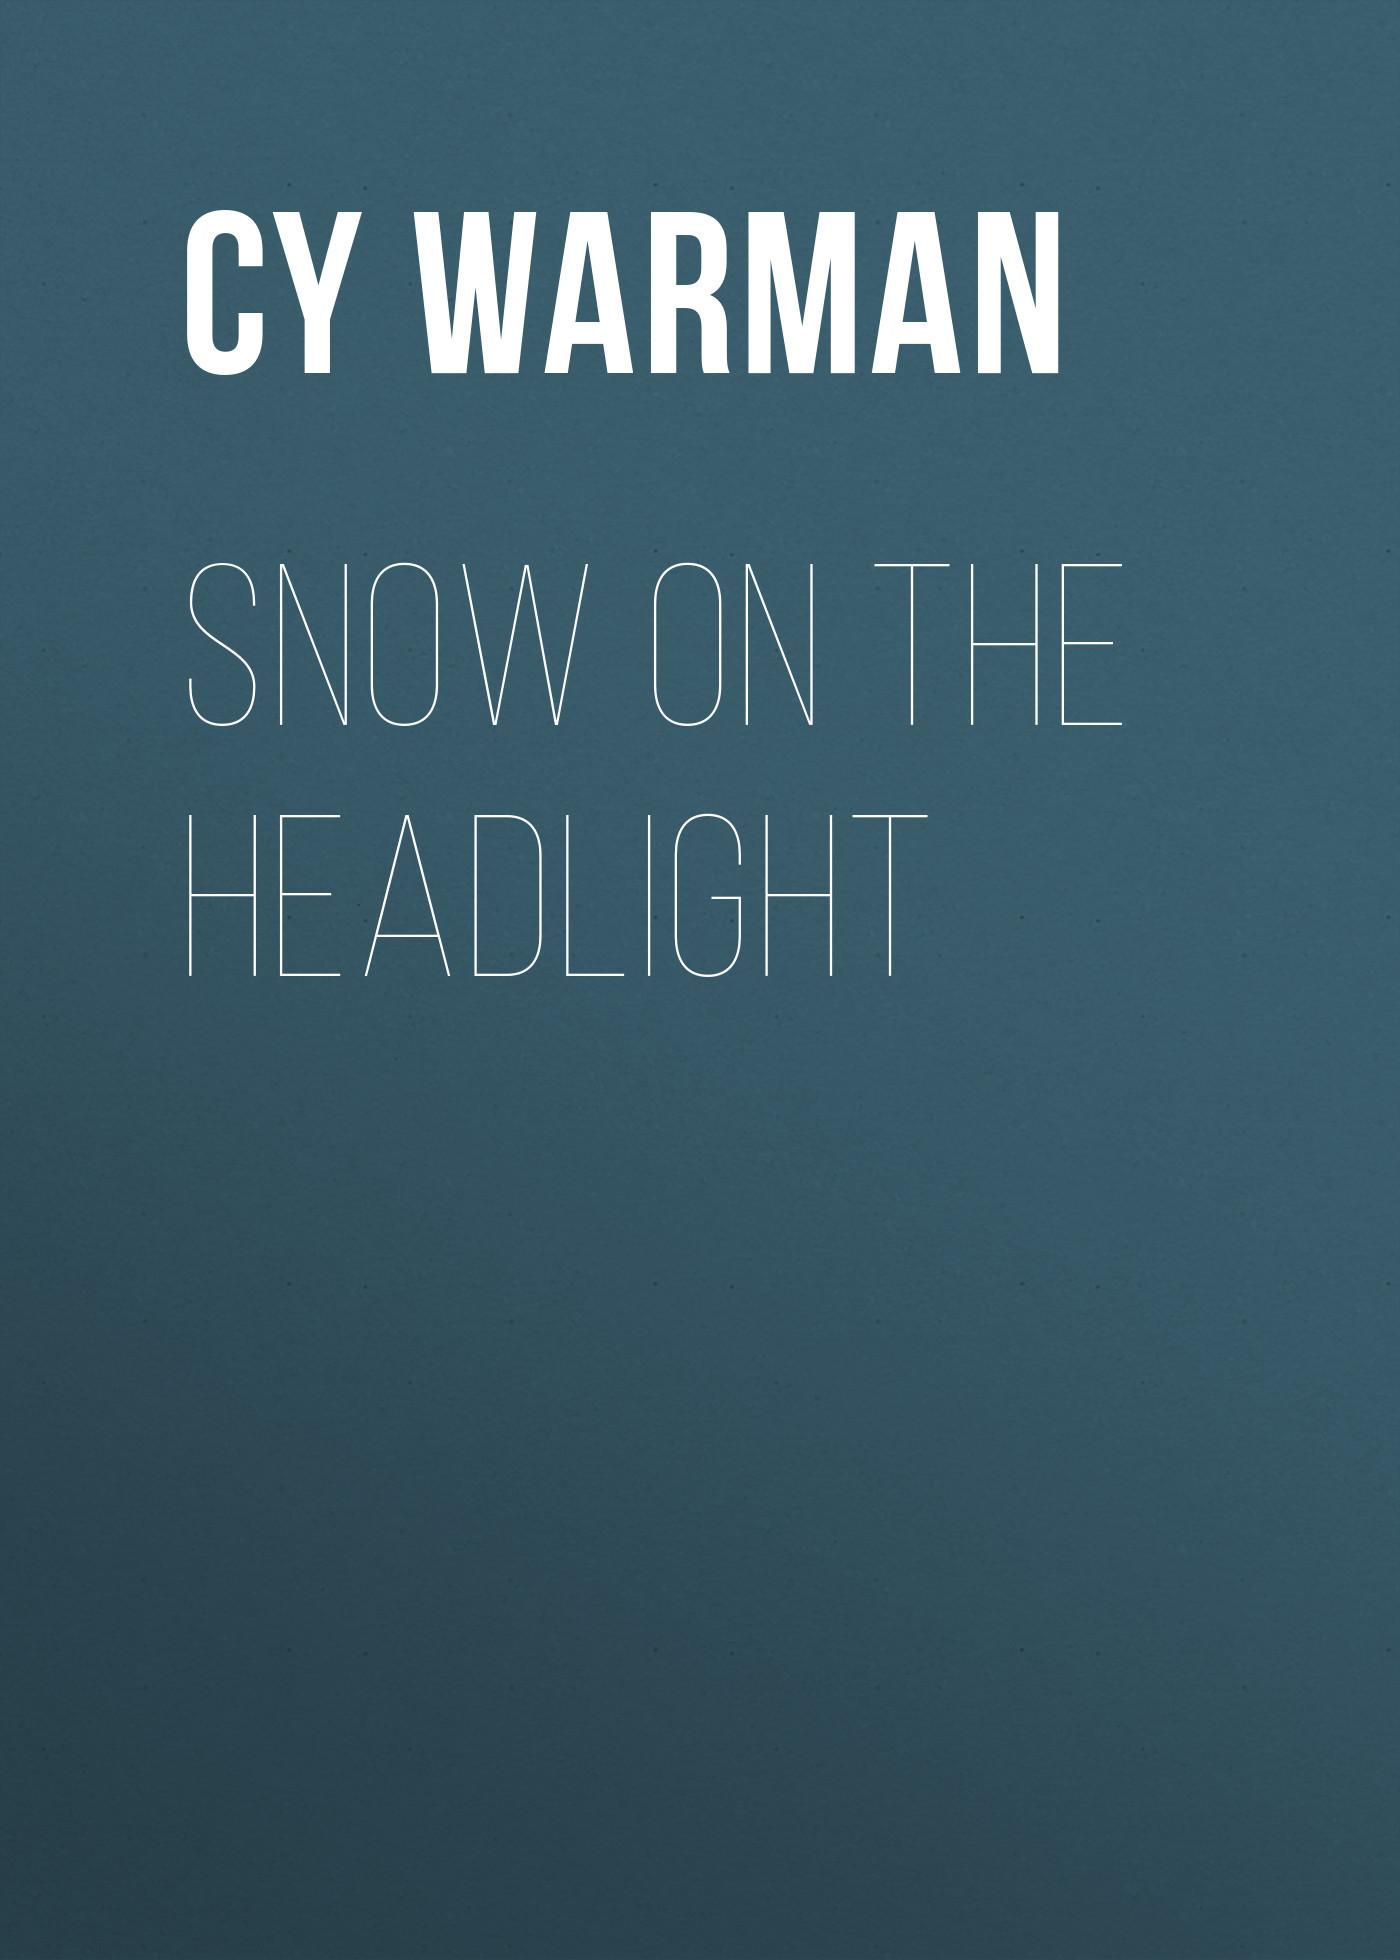 Cy Warman Snow on the Headlight